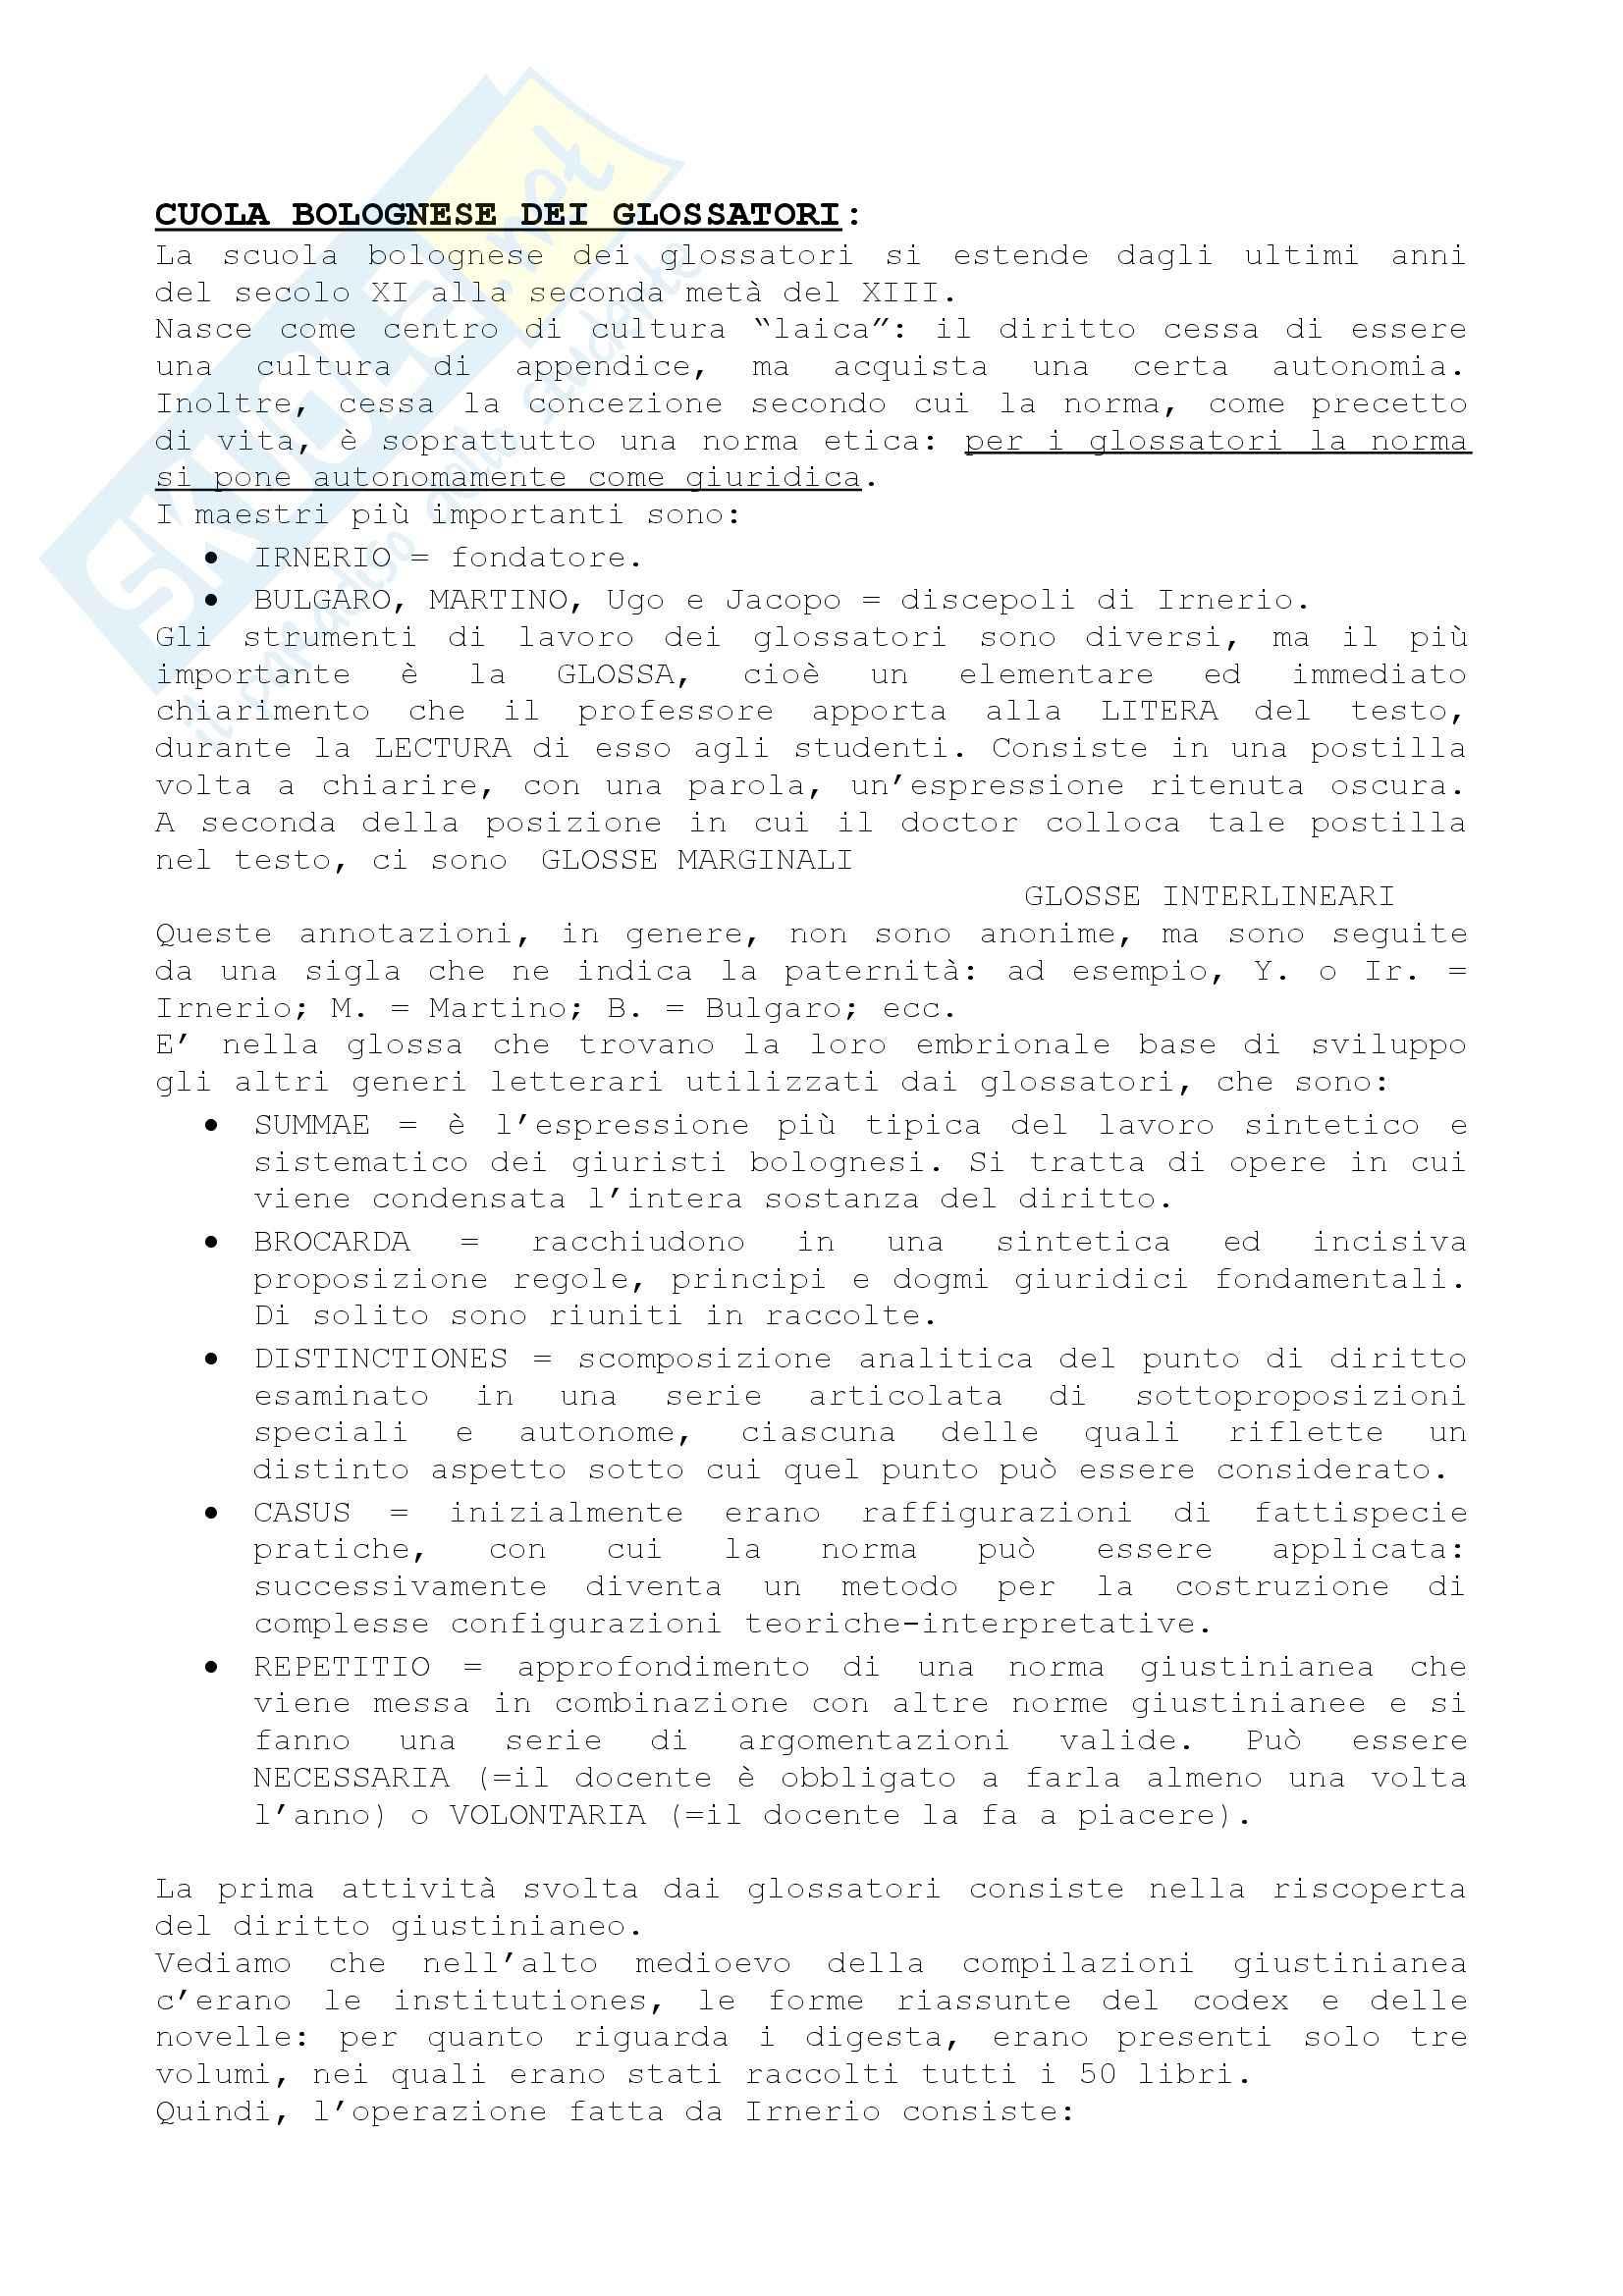 Glossatori e commentatori - Cavanna